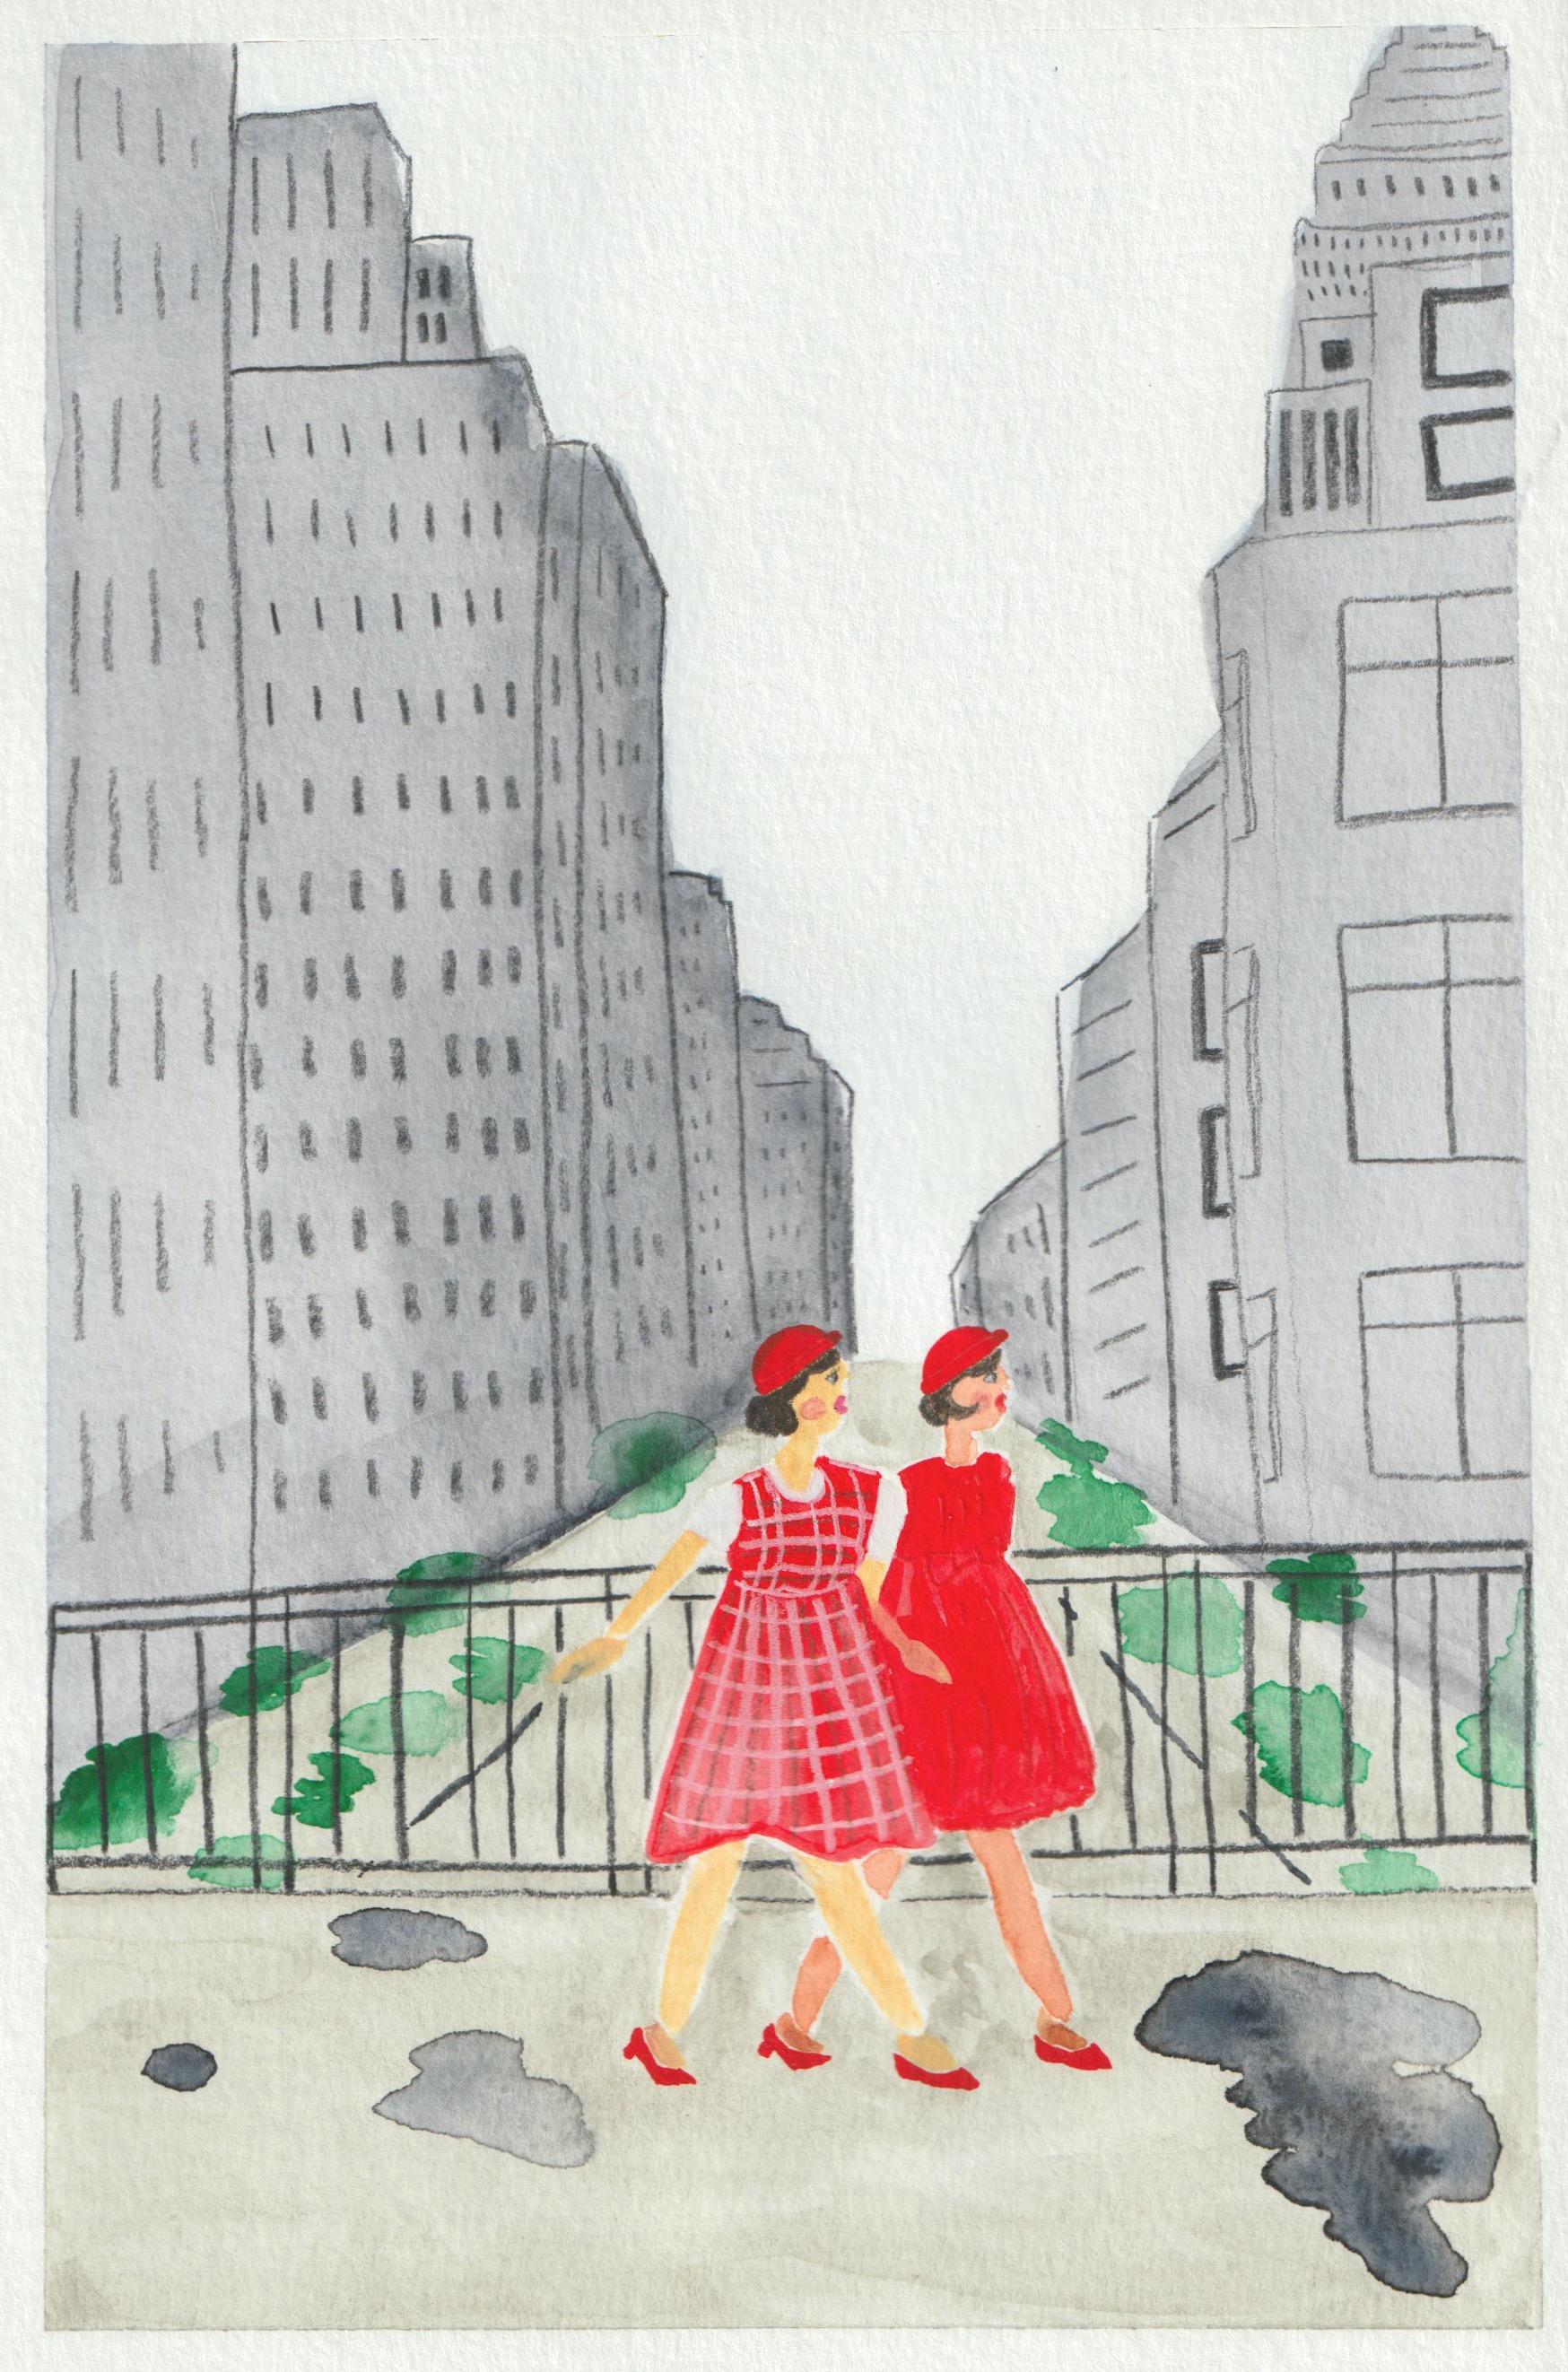 Stylish Women in NYC